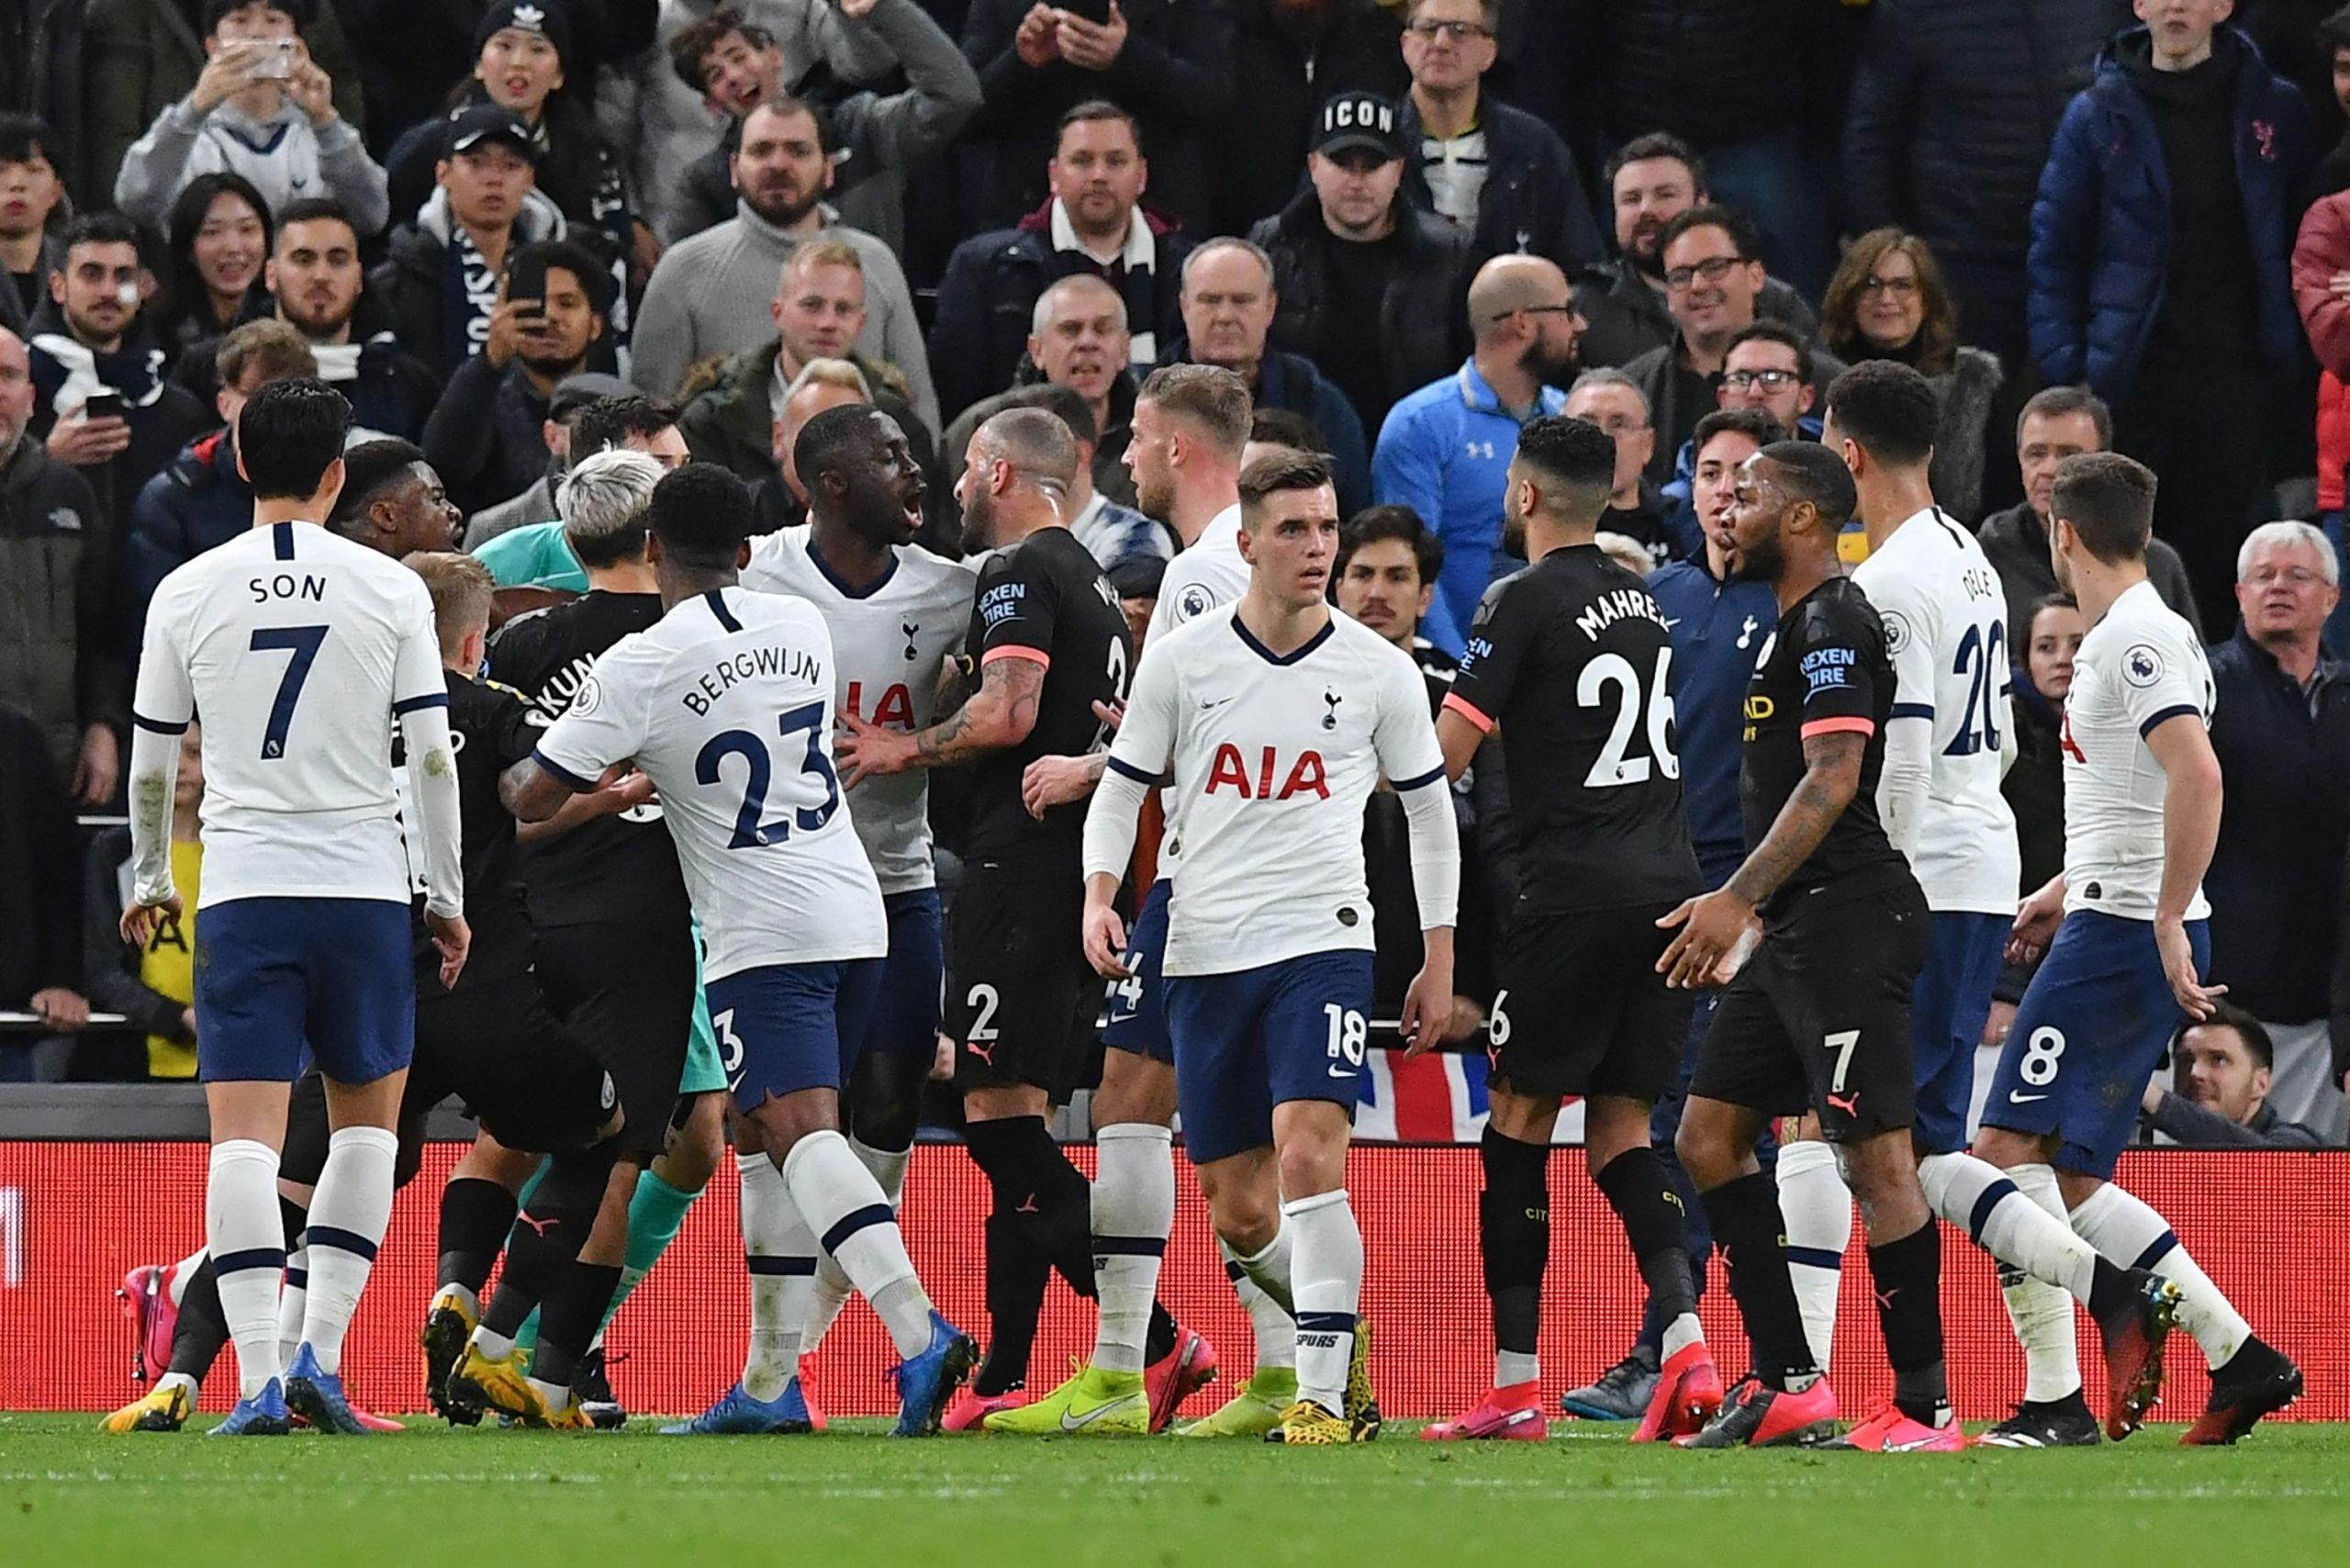 «Тоттенхэм» – «Манчестер Сити»: прогноз и ставка Владимира Чаплыгина